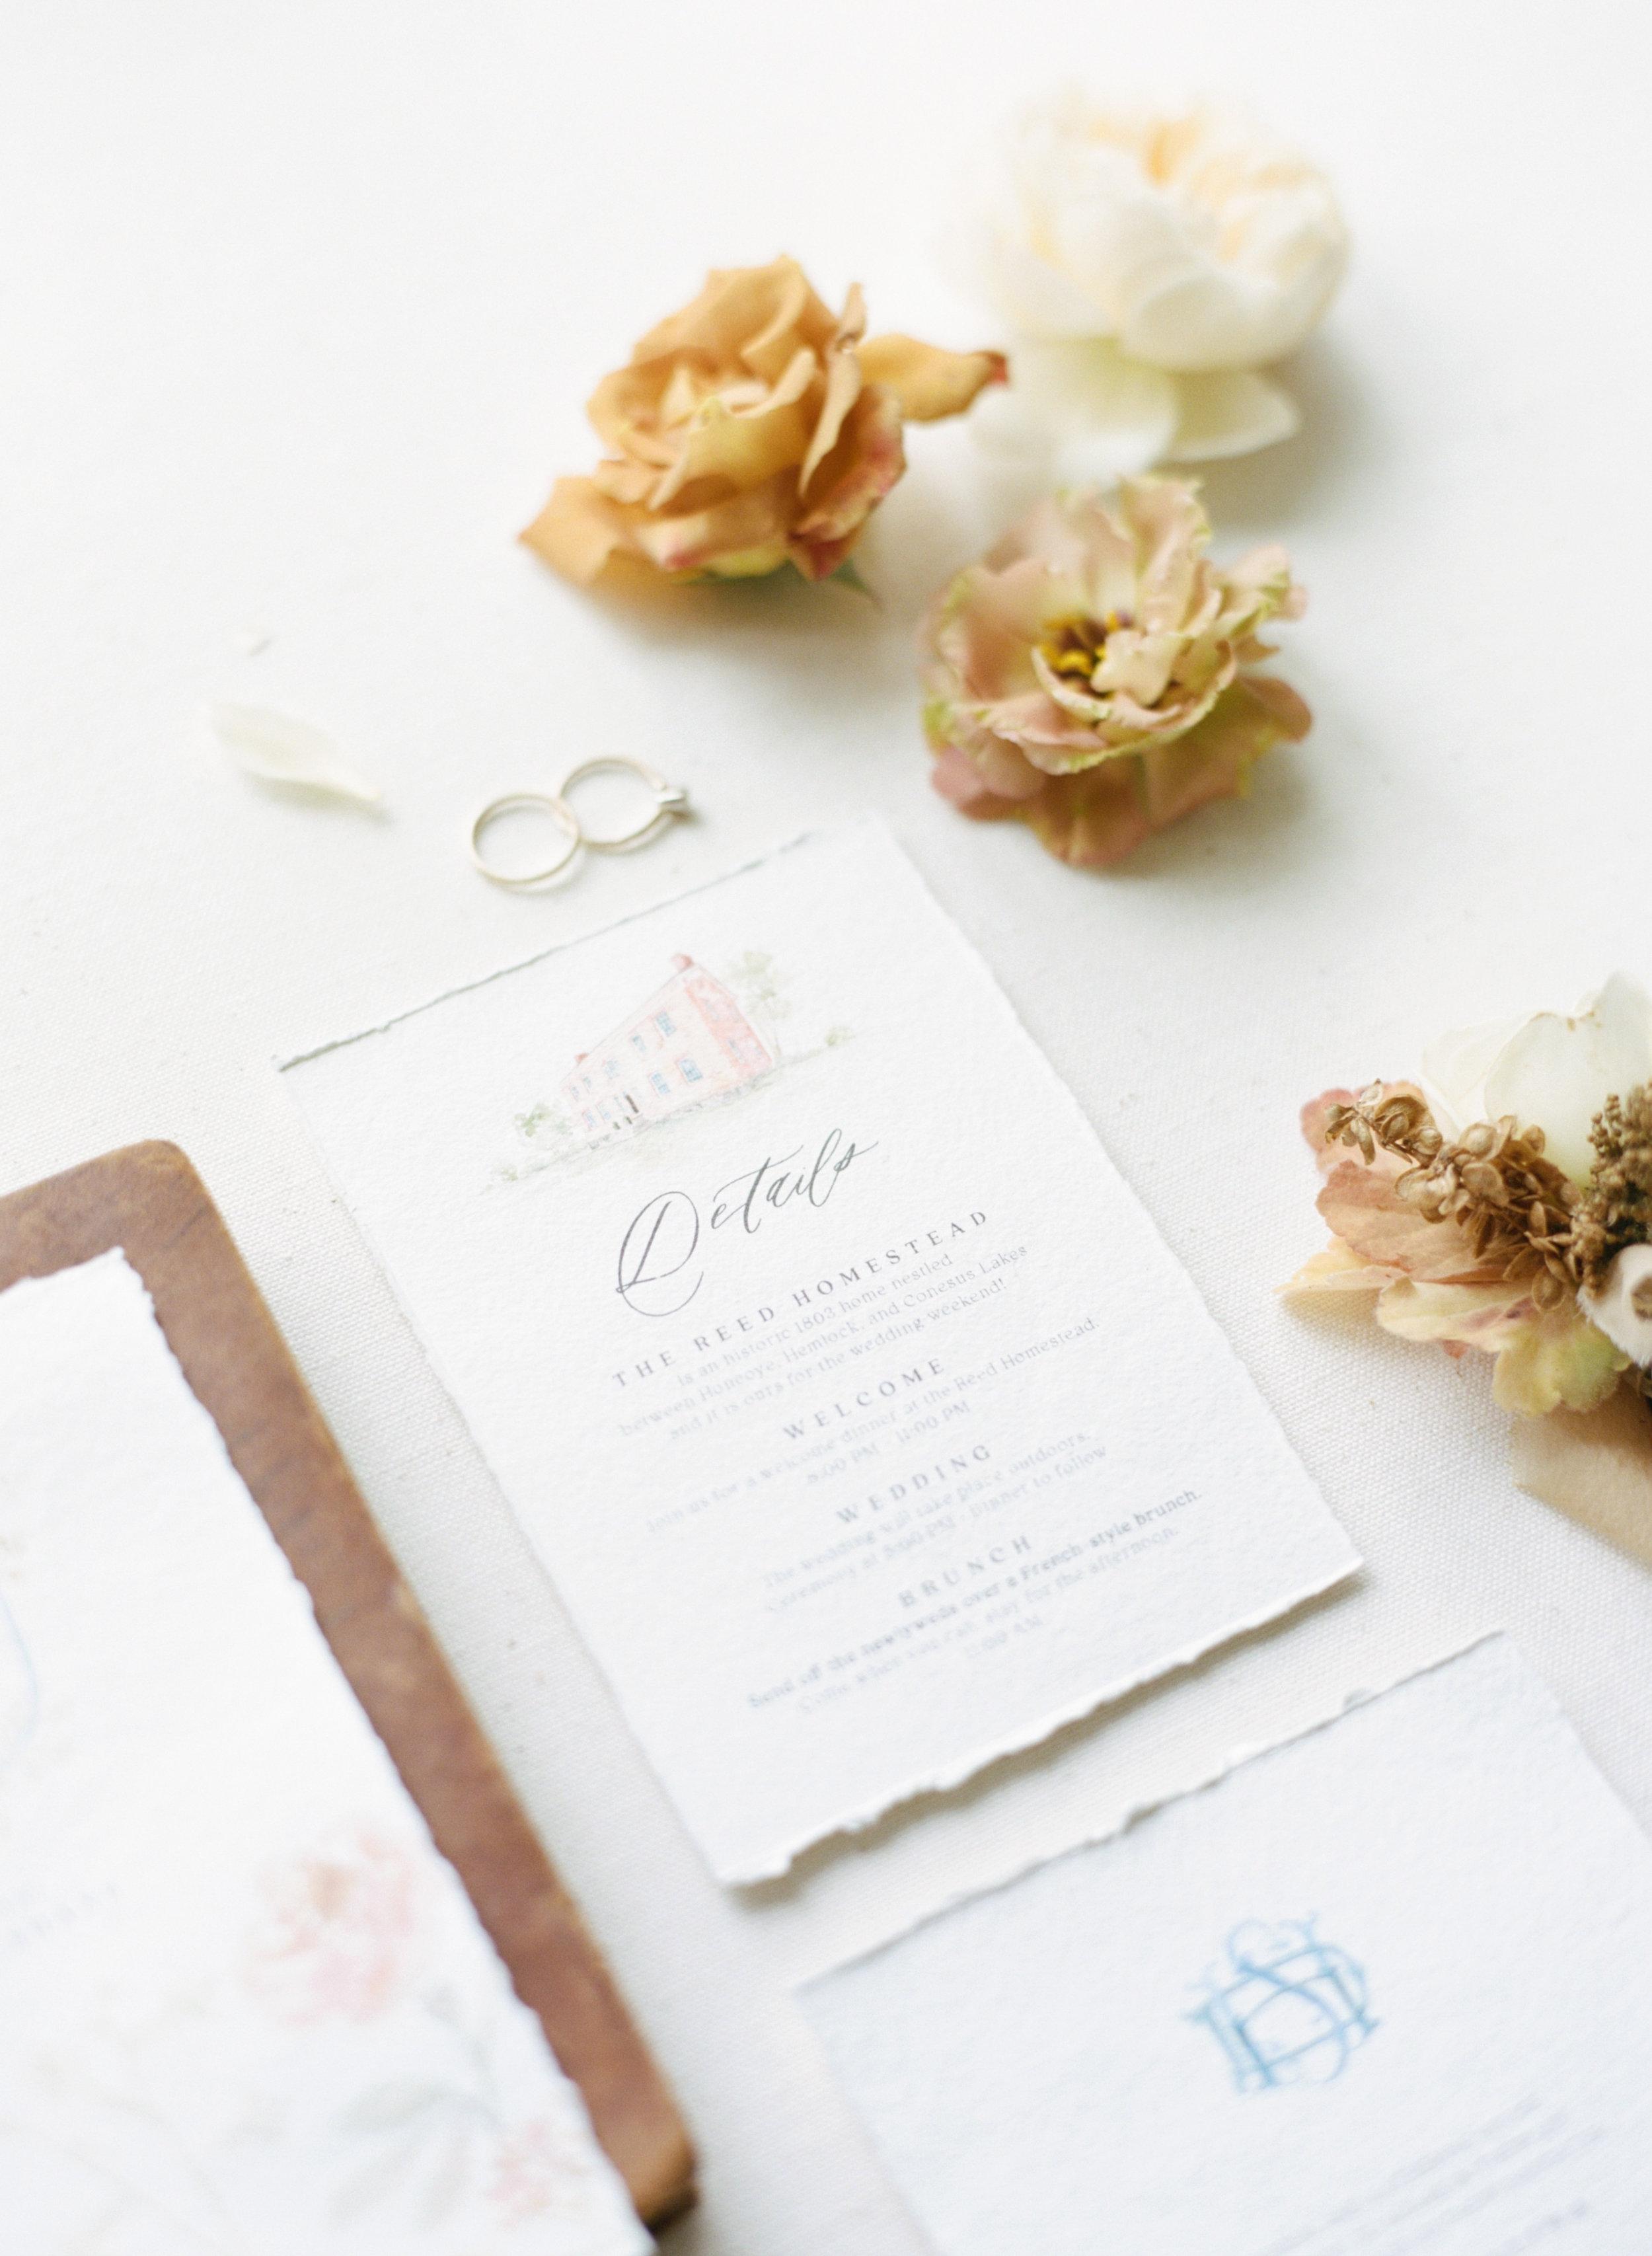 alexandra-meseke-understated-soft-luxury-wedding-upstate-ny_0004.jpg